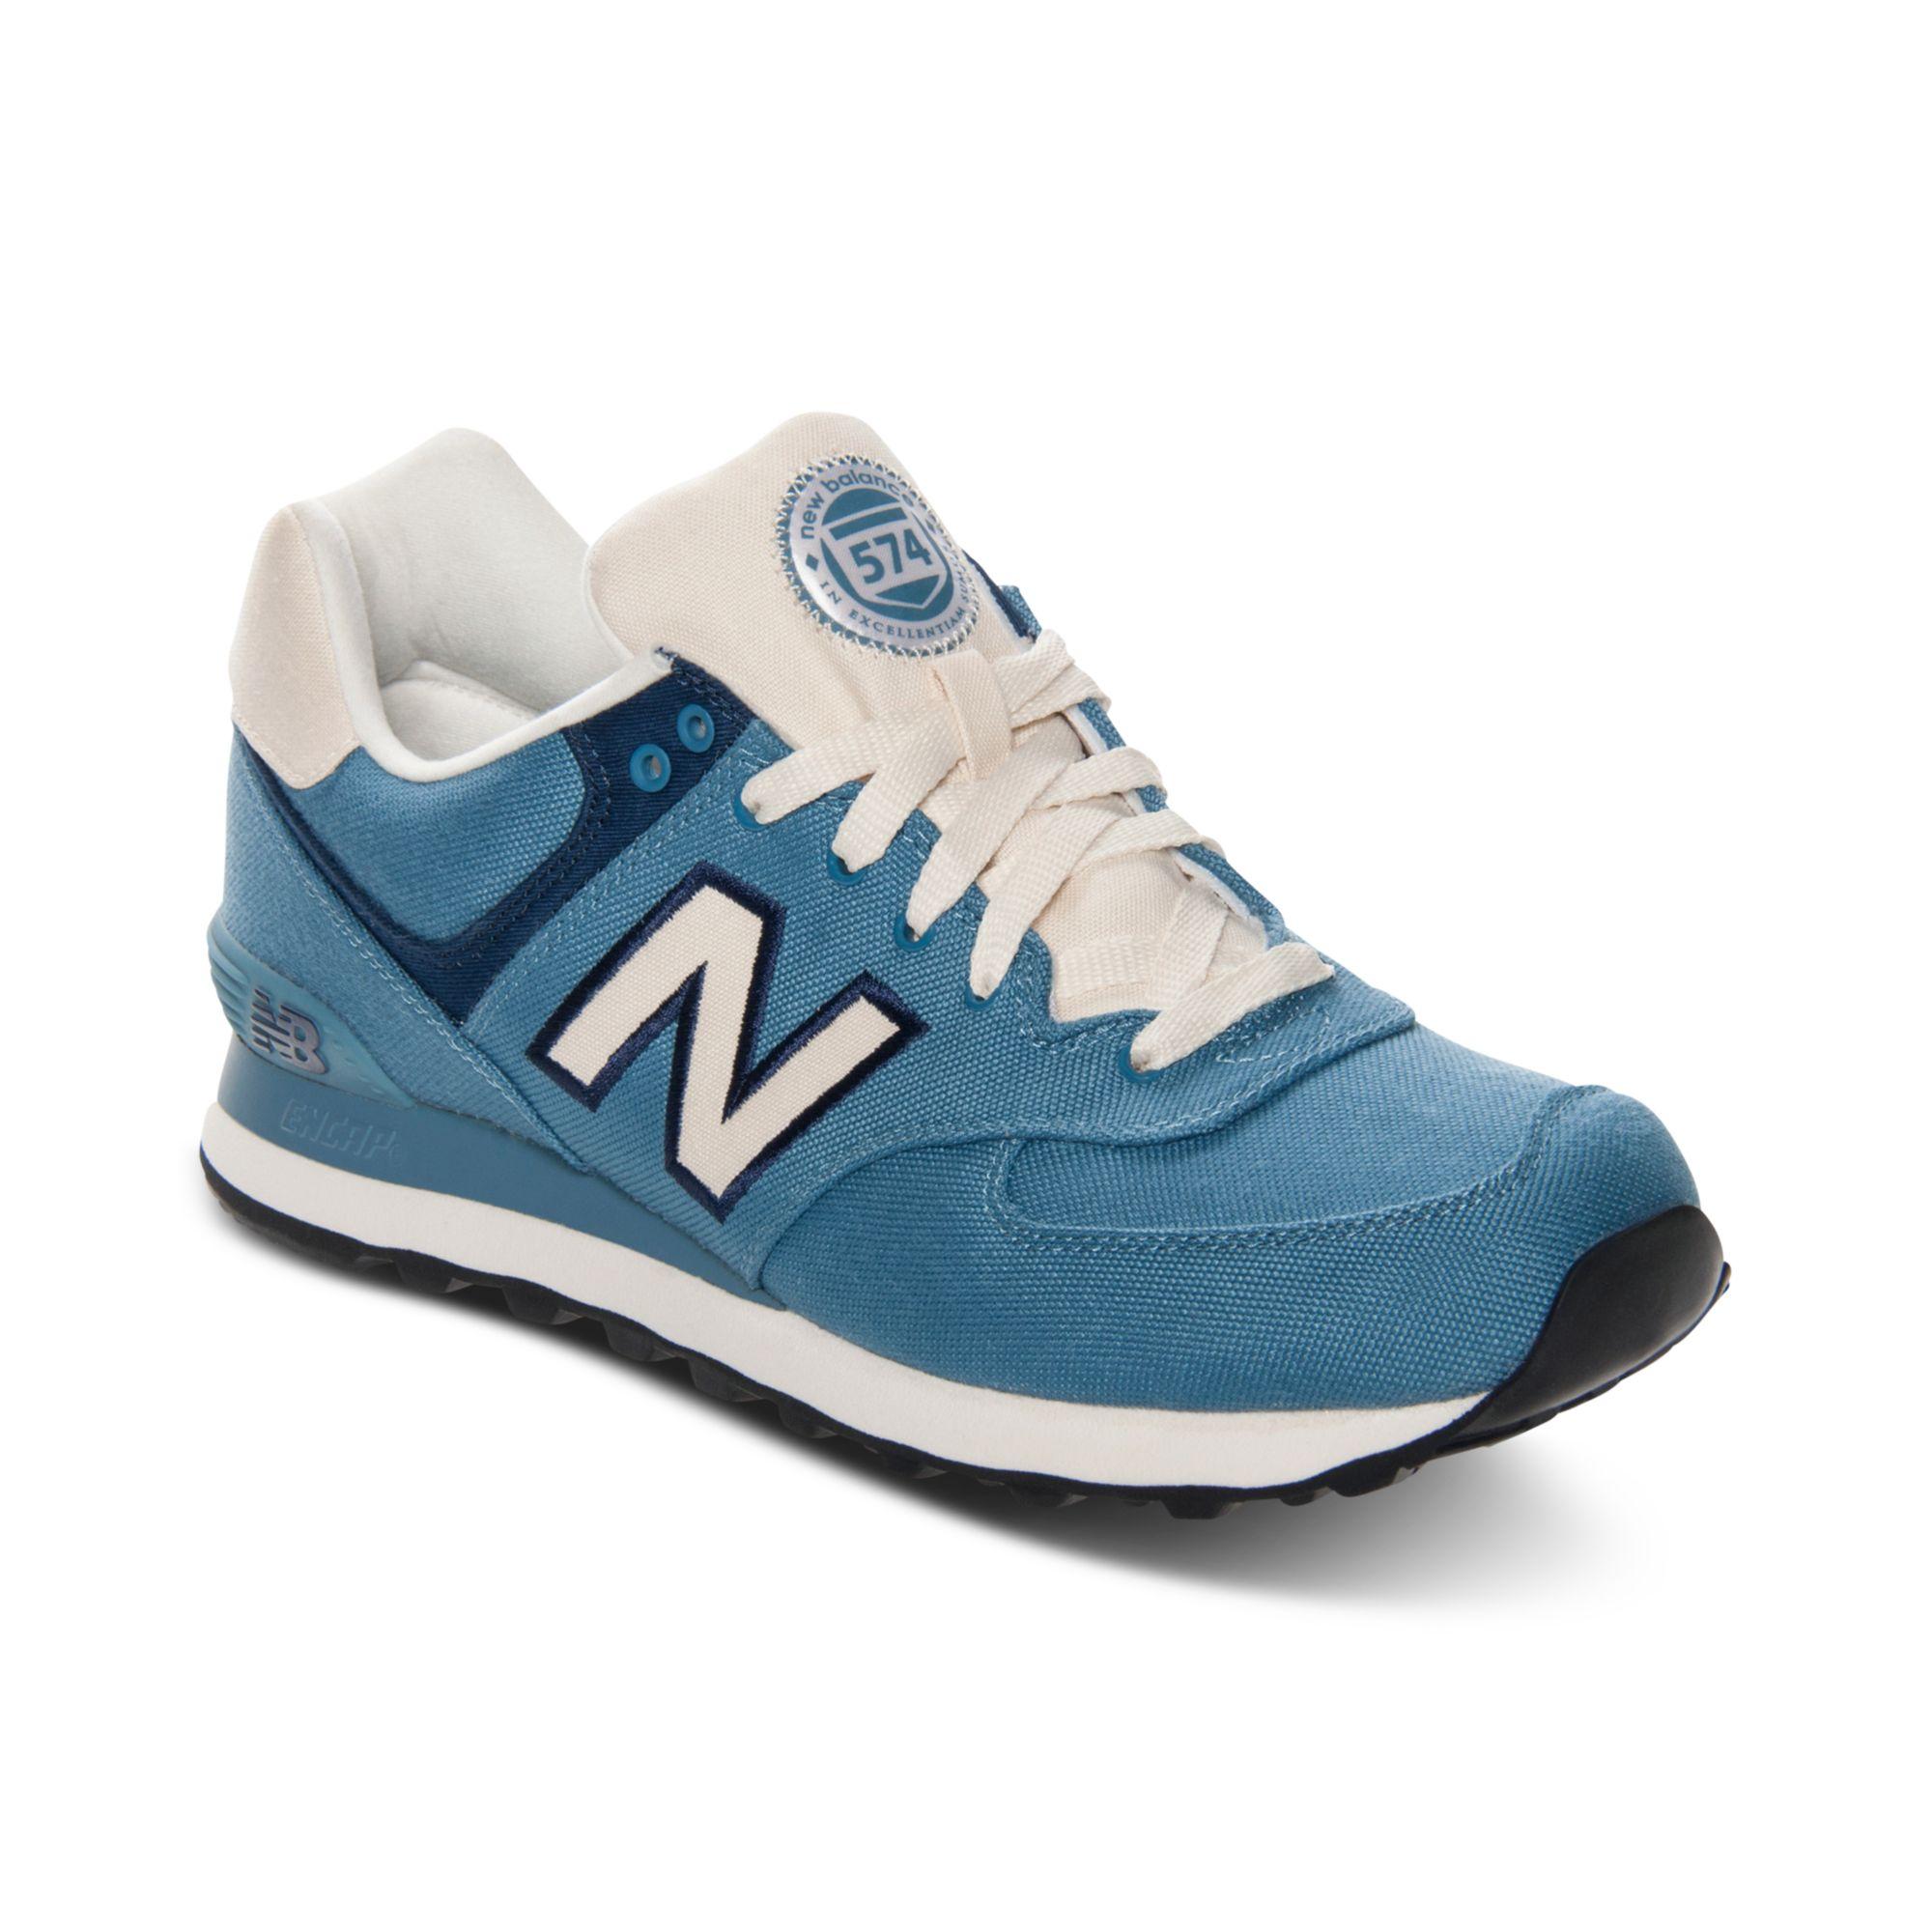 Carolina Blue Converse Shoes